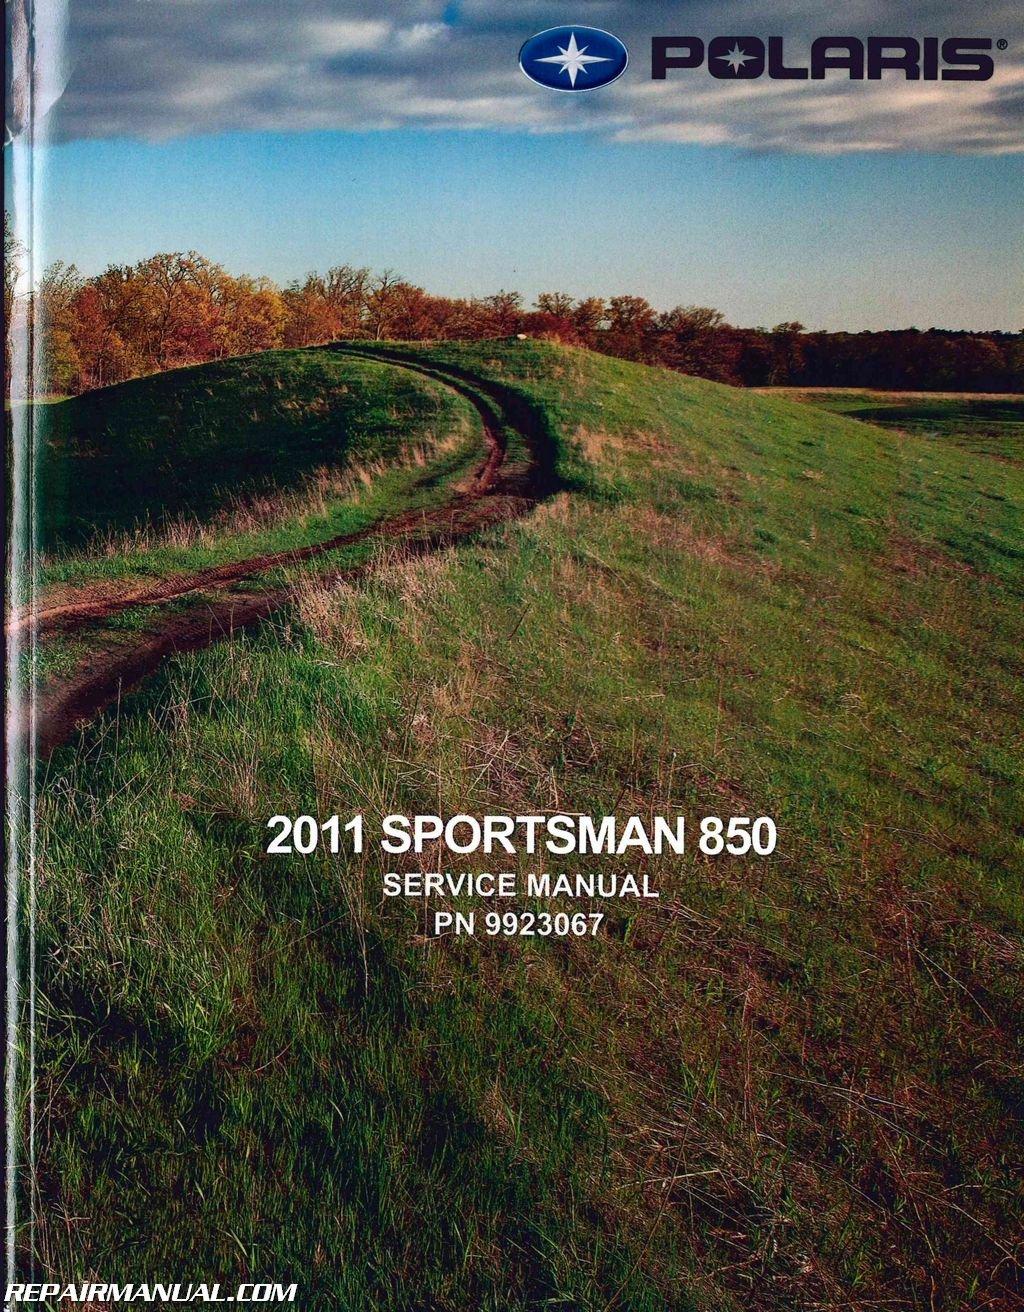 9923067 2011 Polaris Sportsman 850 ATV Service Manual: Manufacturer:  Amazon.com: Books